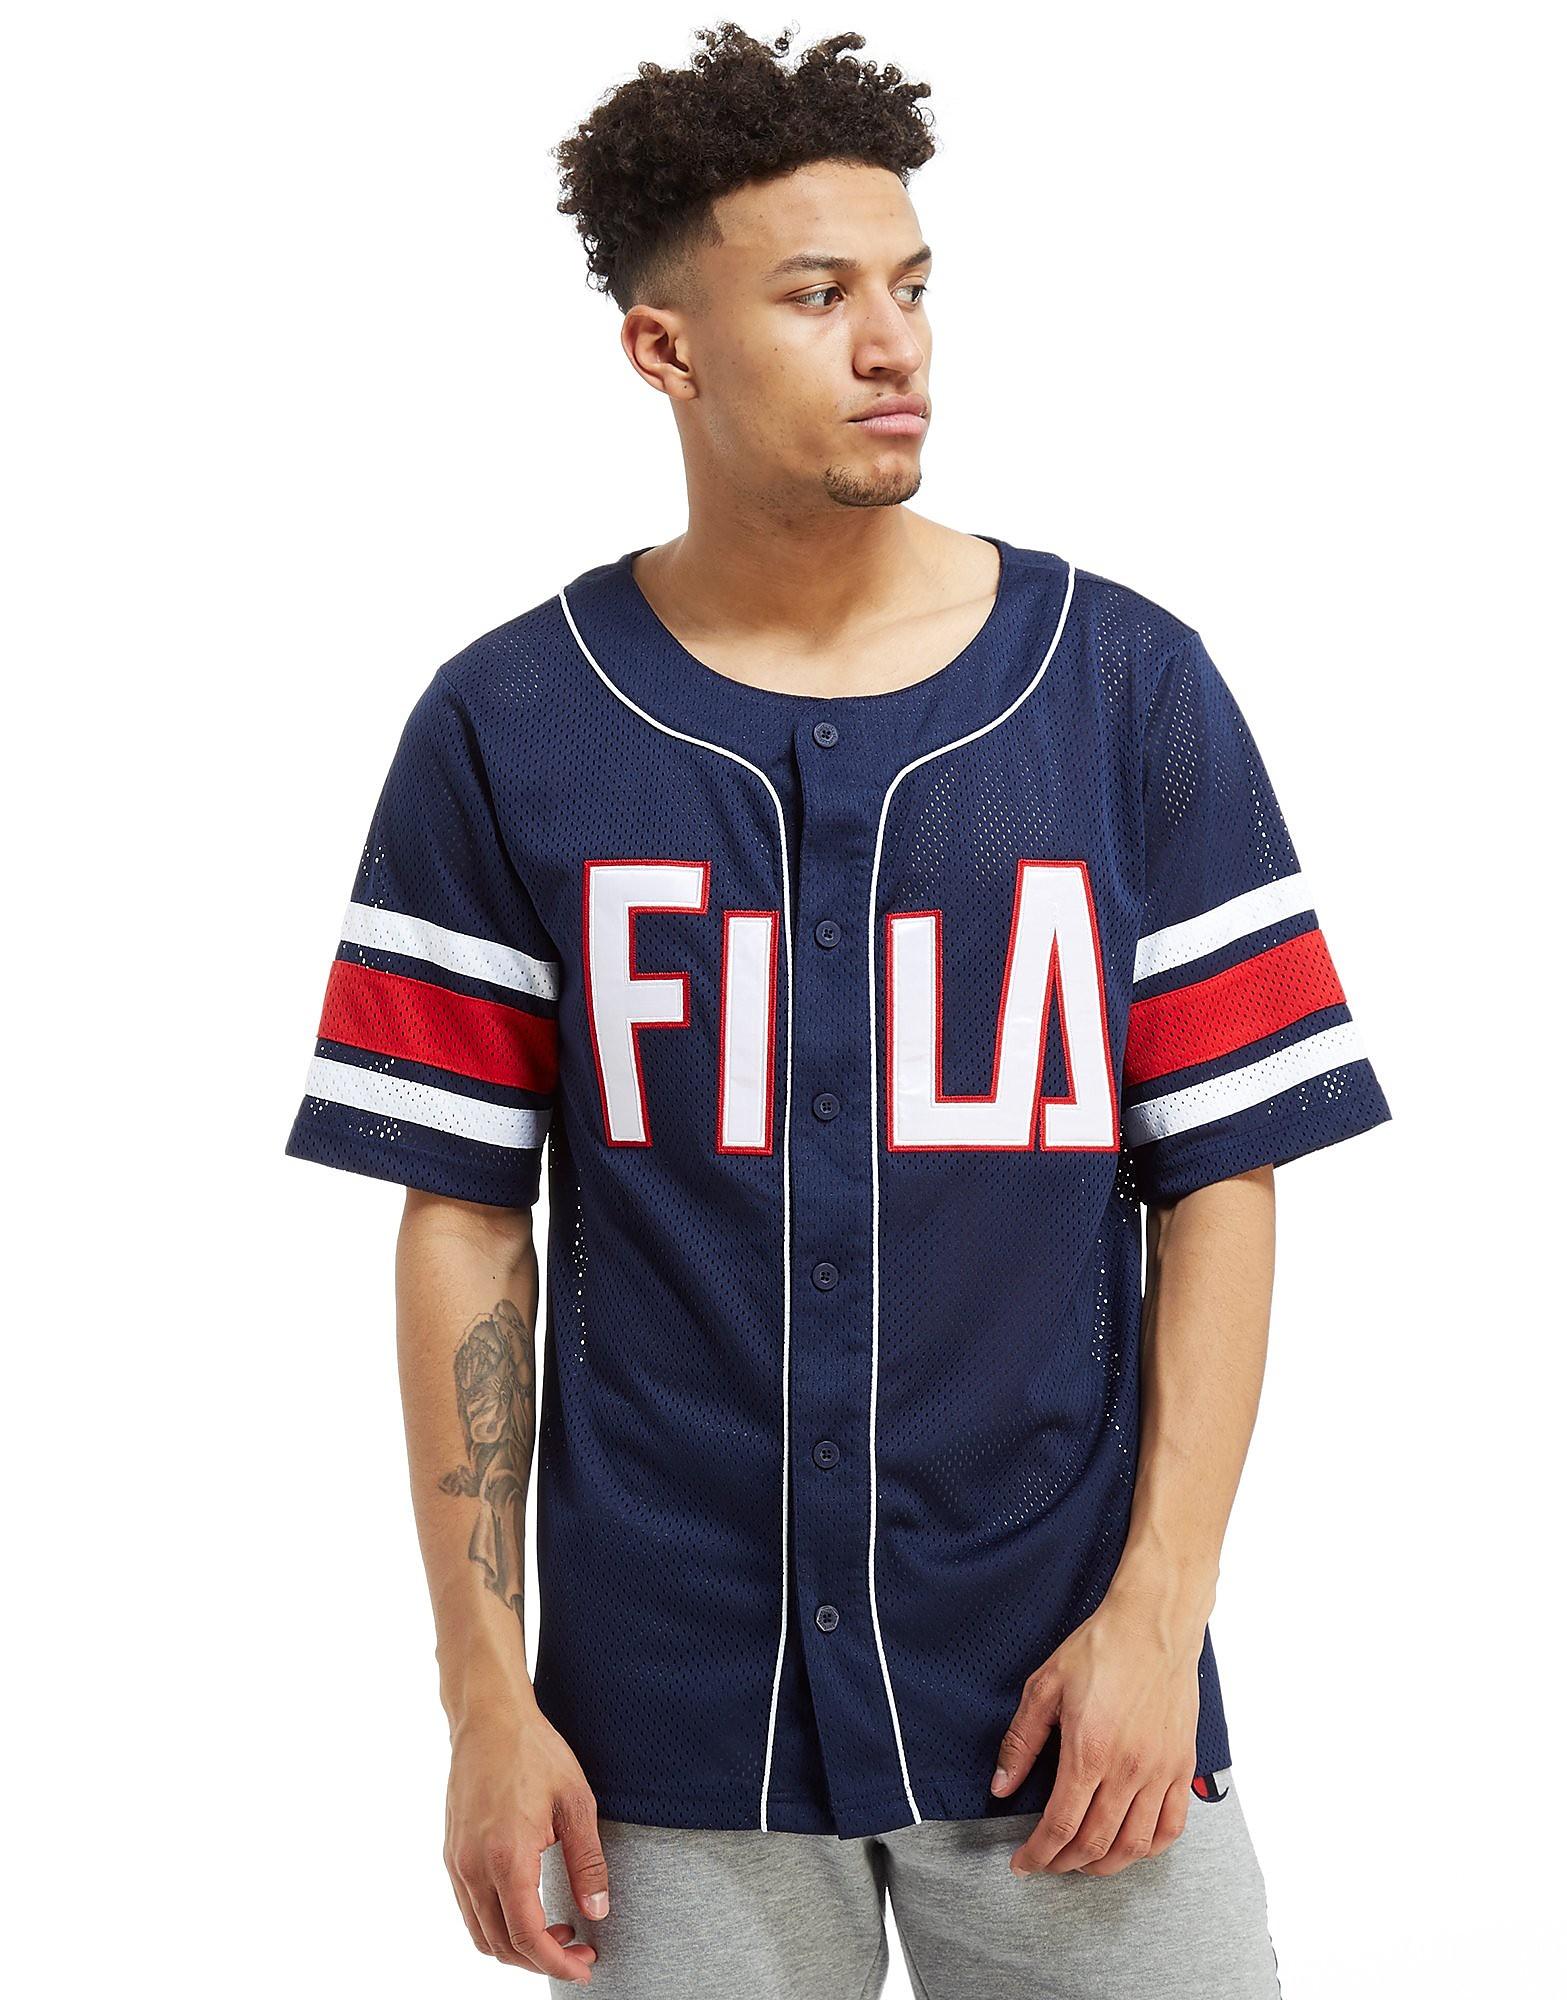 Fila Kyler Mesh Baseball Jersey